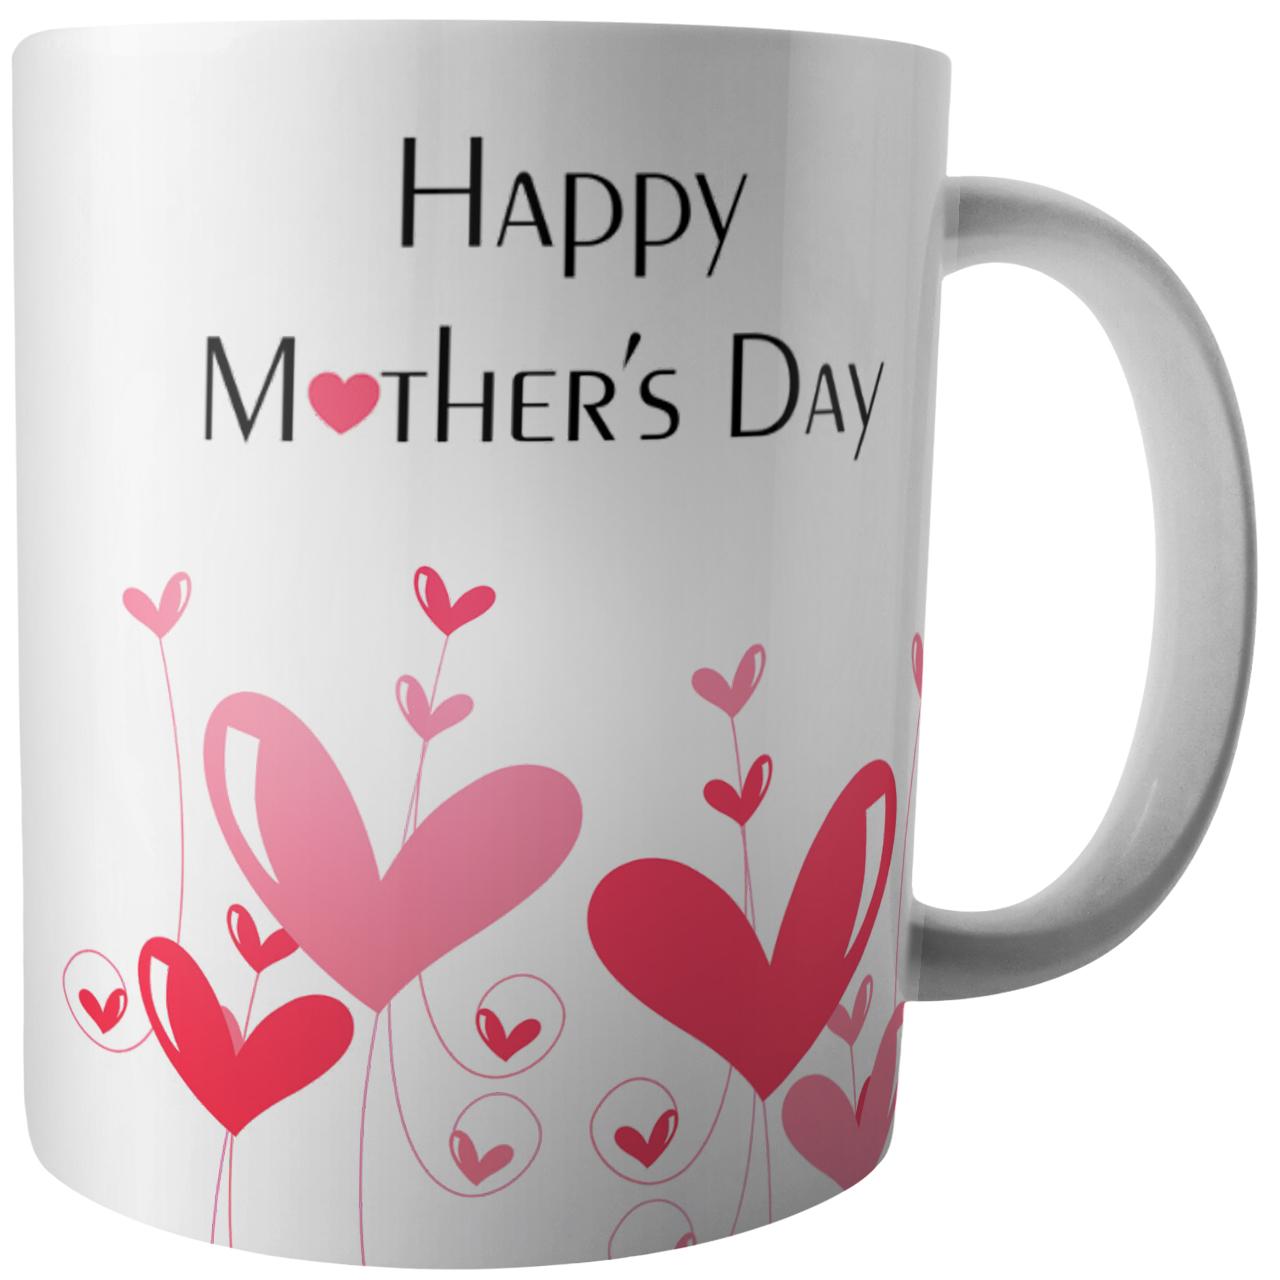 ماگ آکو طرح روز مادر کد B04